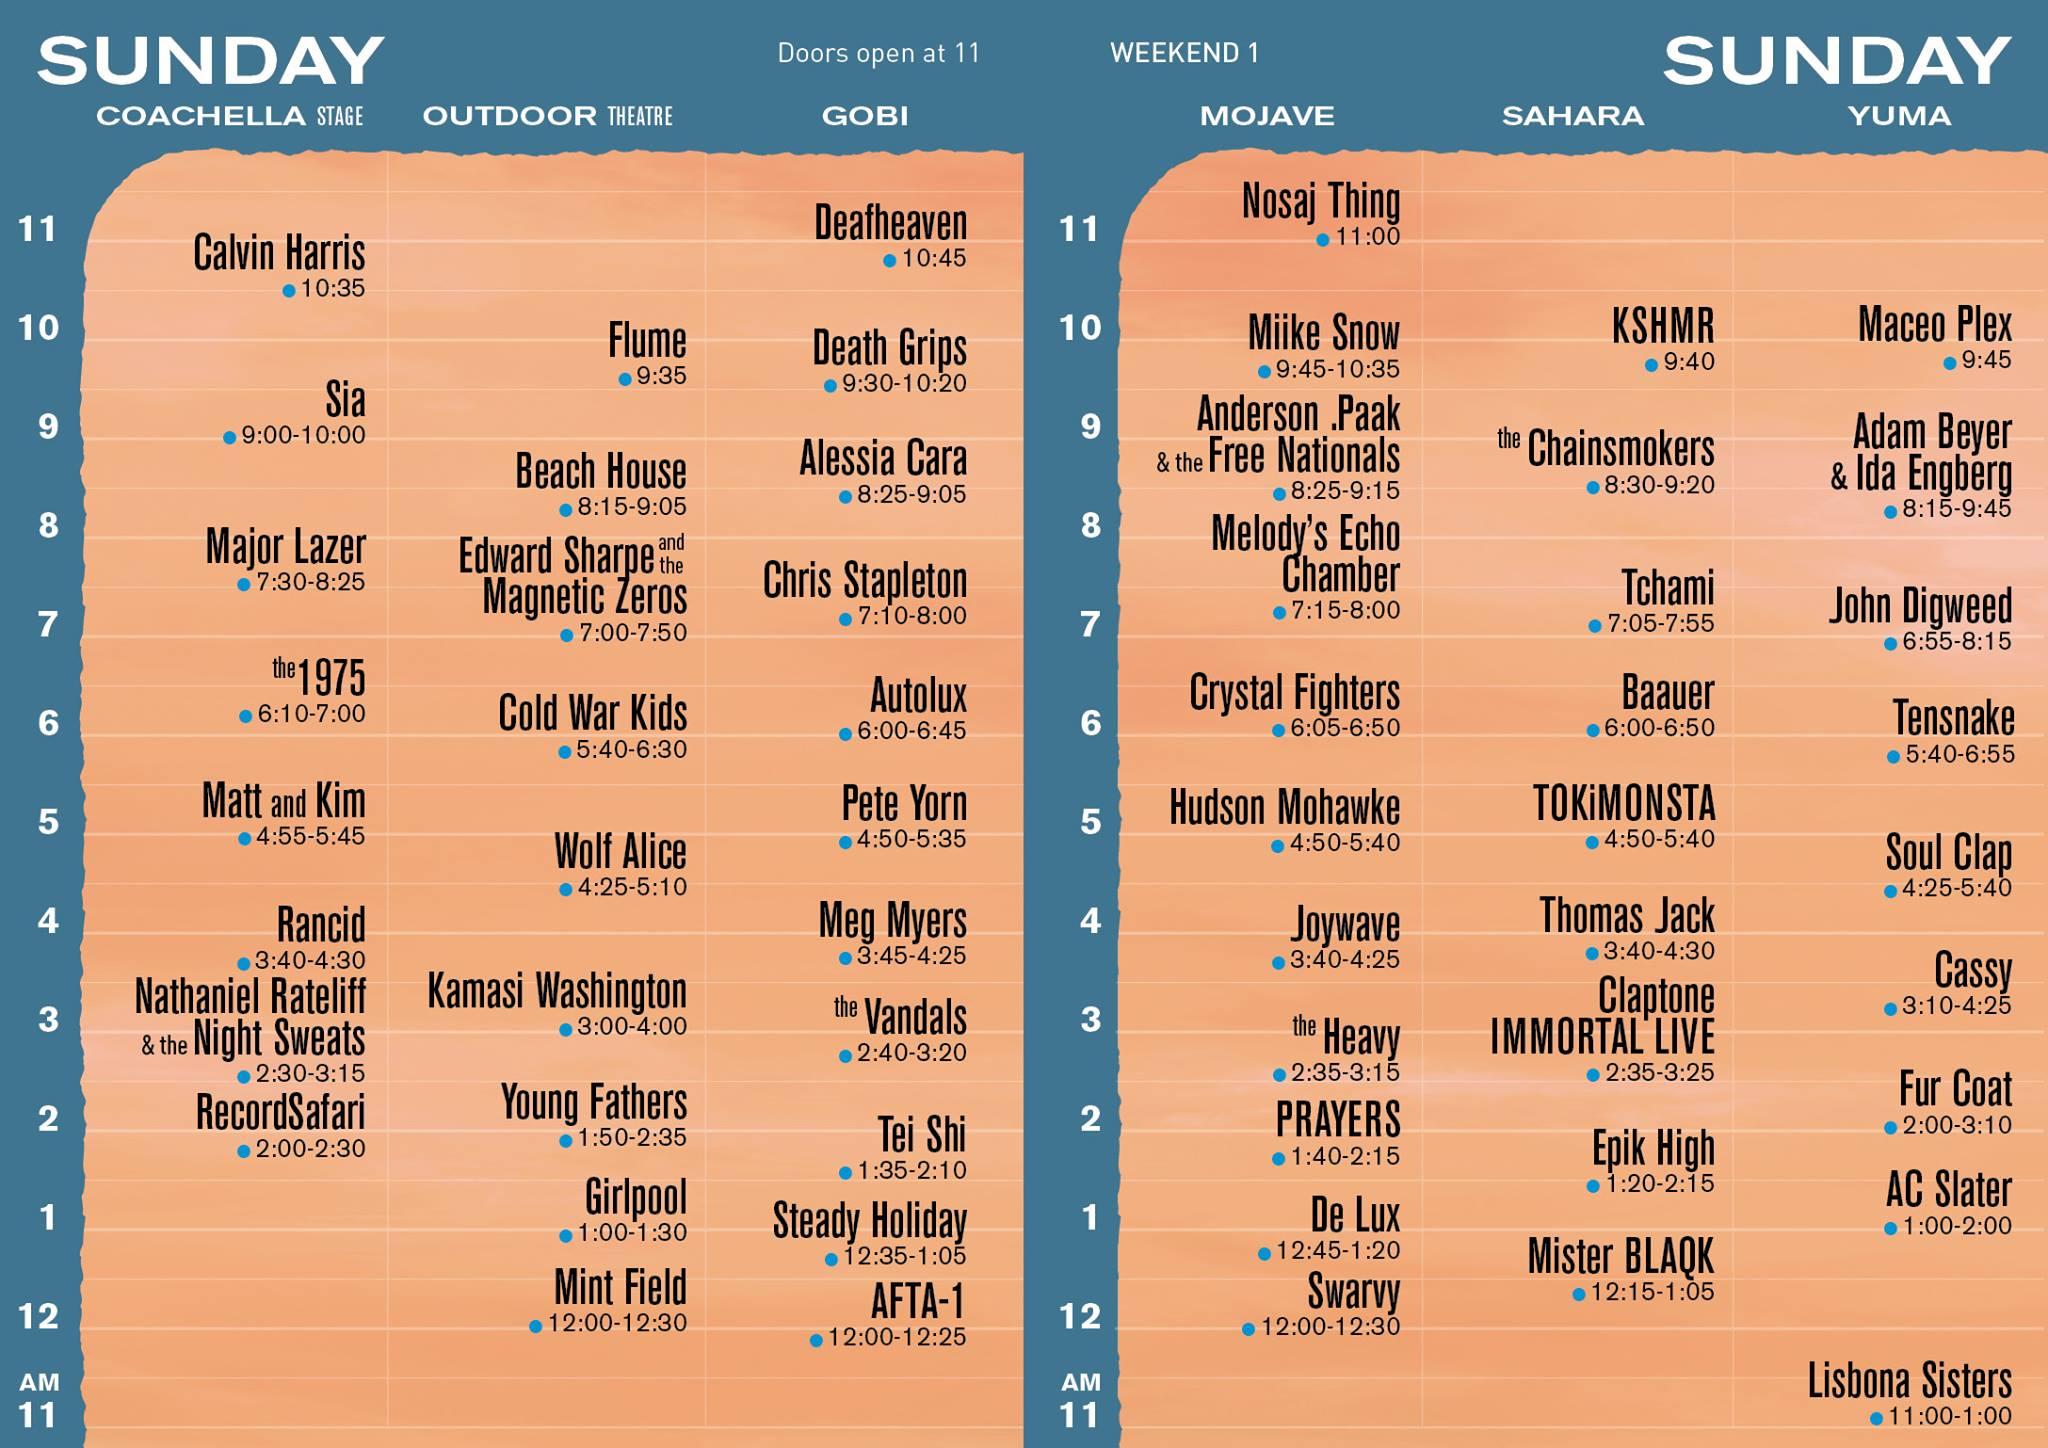 Sunday-Coachella-Set-Times